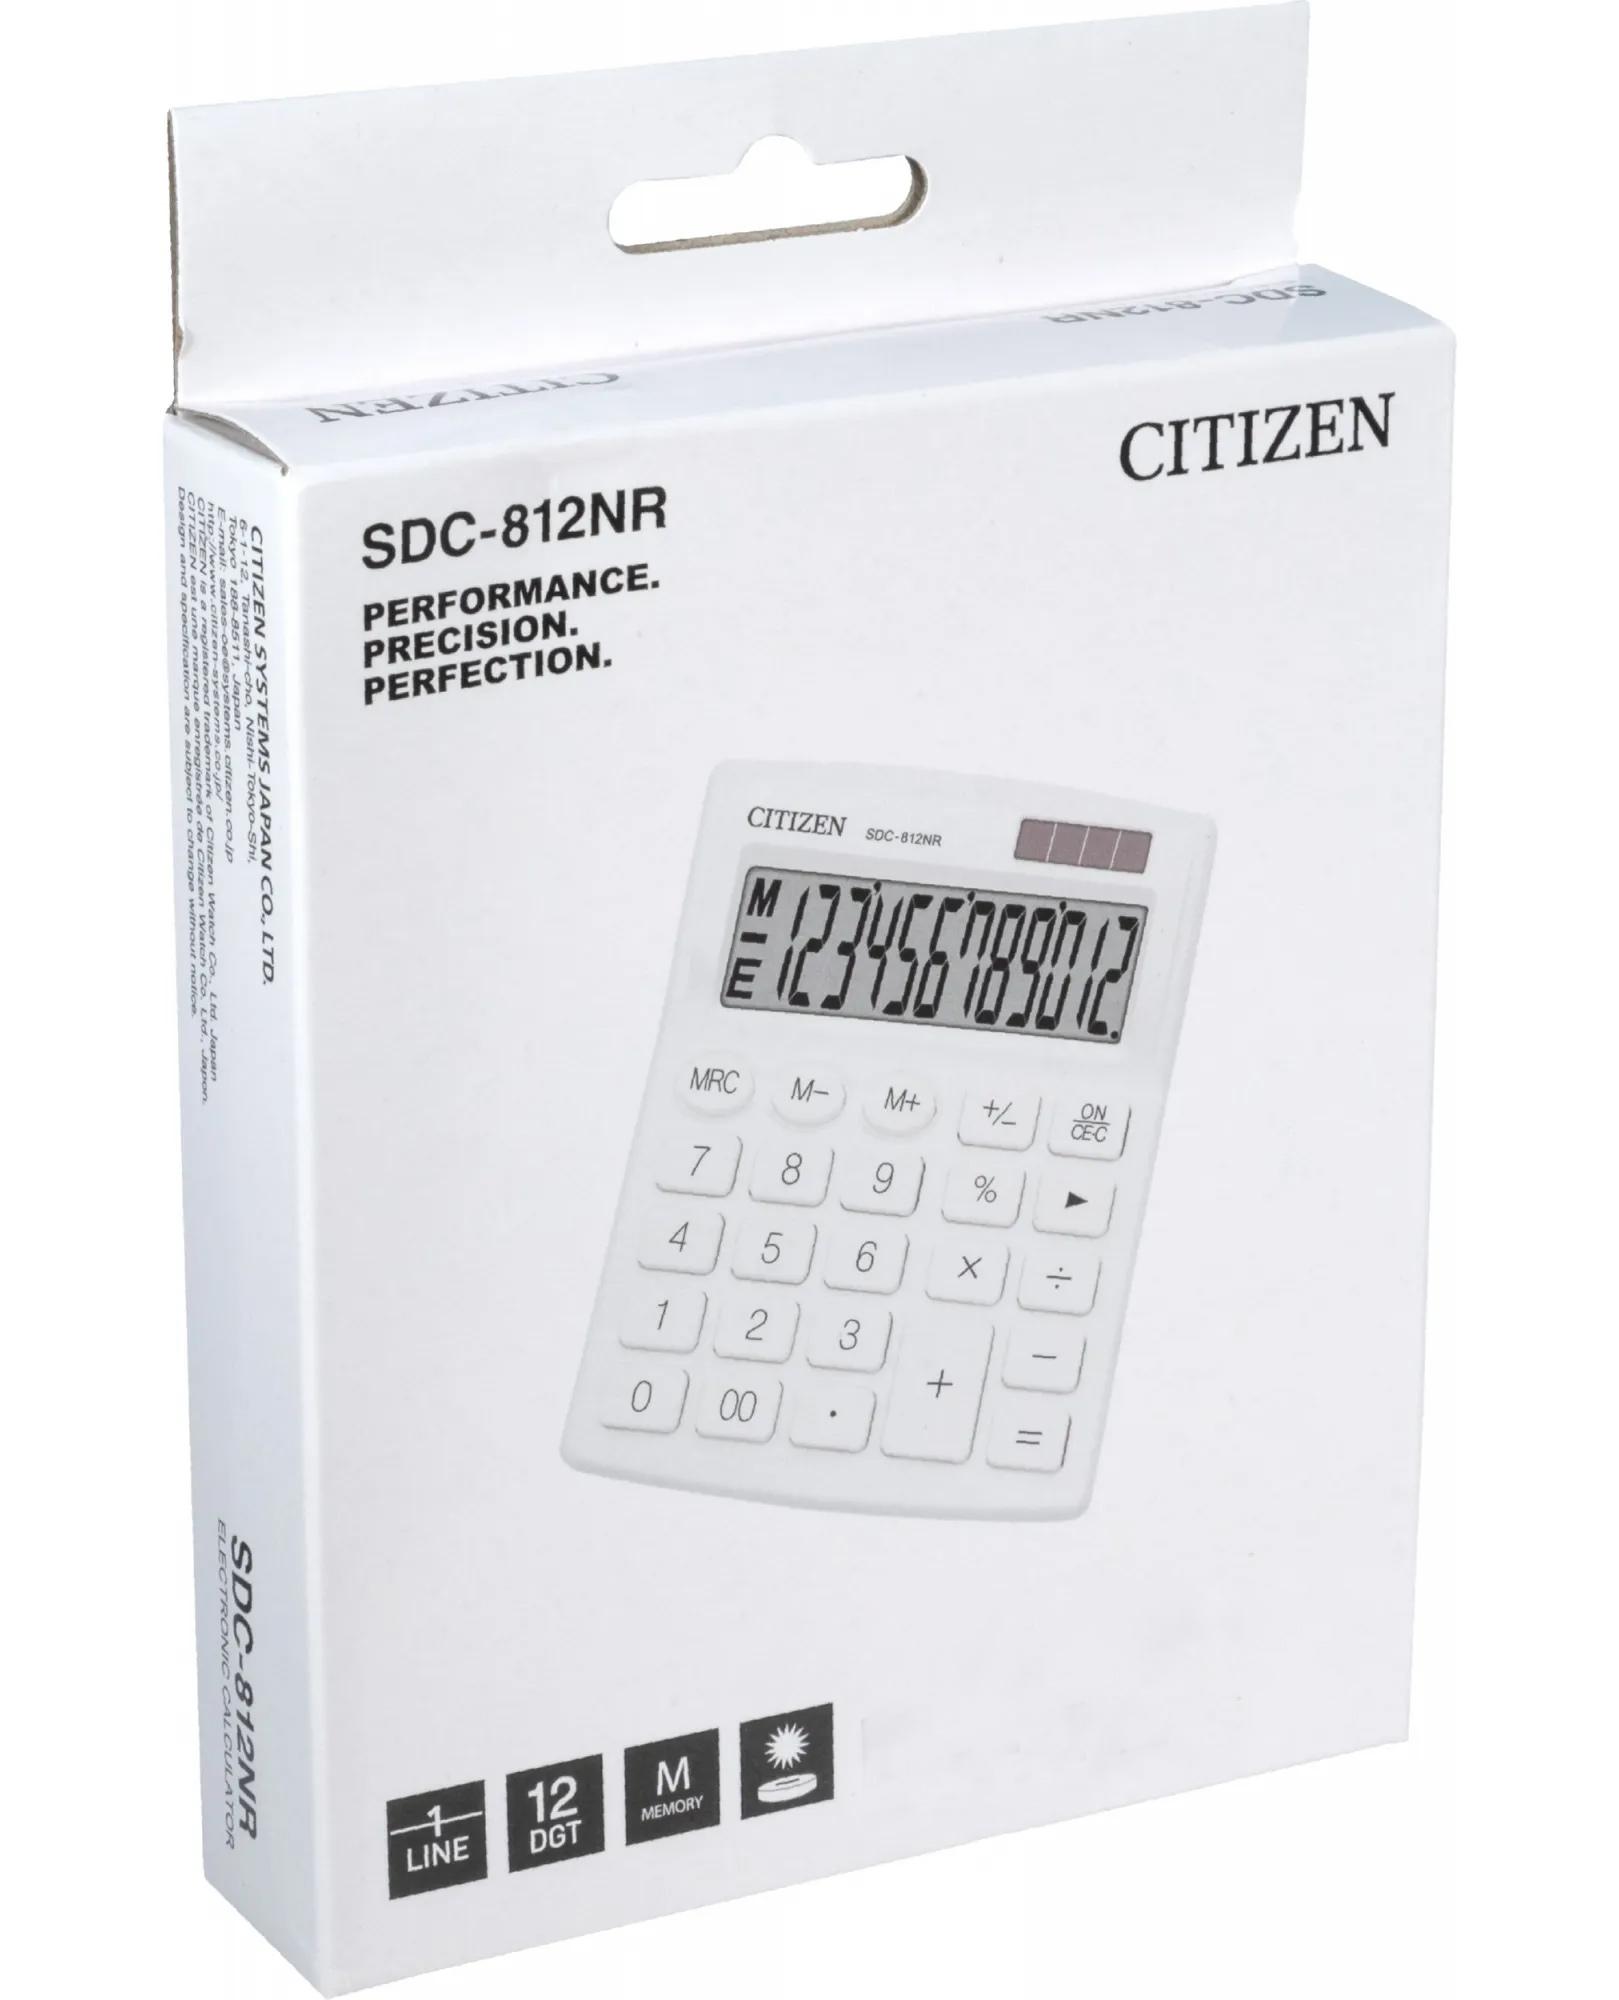 Калькулятор бухгалтерский SDC812NRWHE-white 12 разрядов, 125х100х34мм., бел. Citizen - фото 4